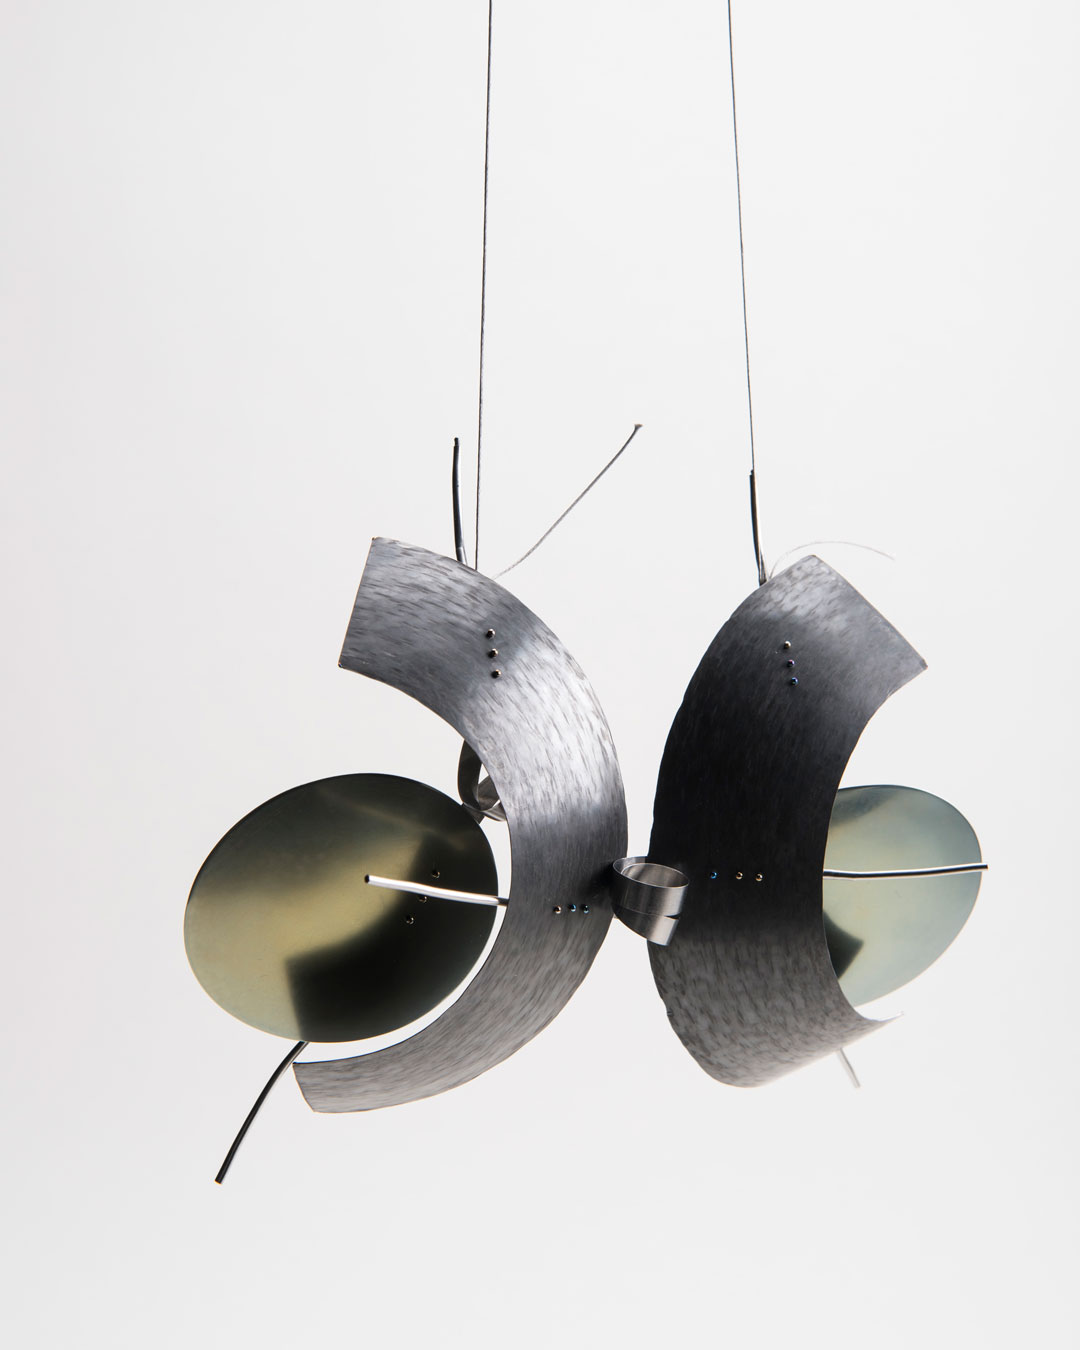 Andrea Wippermann, Ursus Giganteus, 2018, pendant; stainless steel, titanium, nylon, blackened silver, 150 x 180 x 40 mm, €2450